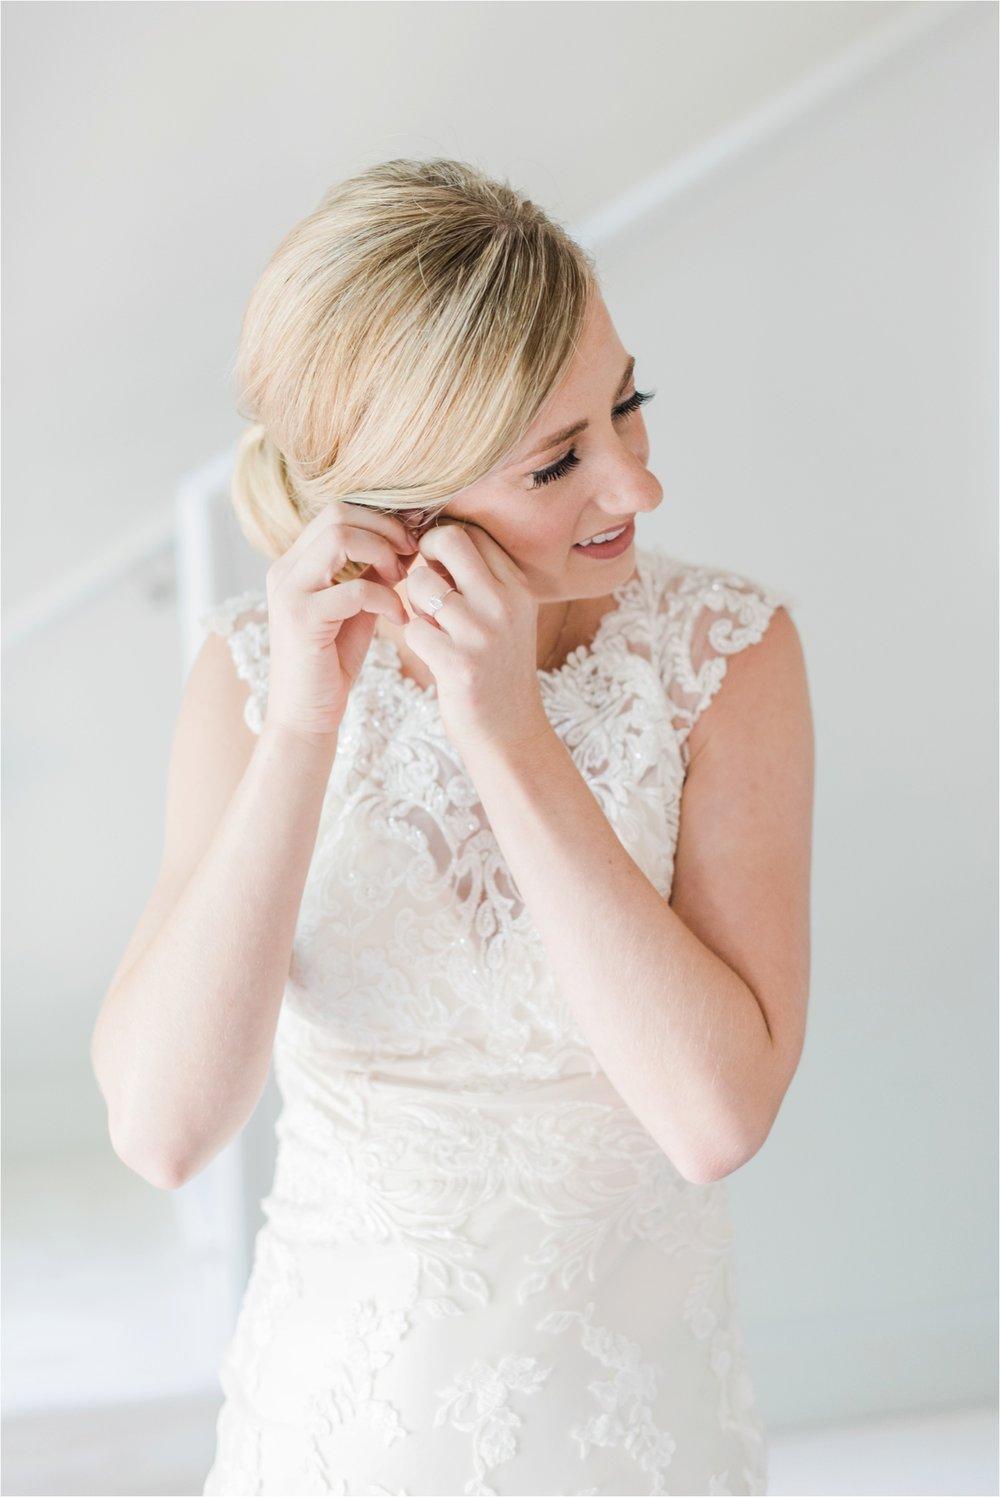 virginia-wedding-photographer-theoverlook-wedding-photo_0016.jpg